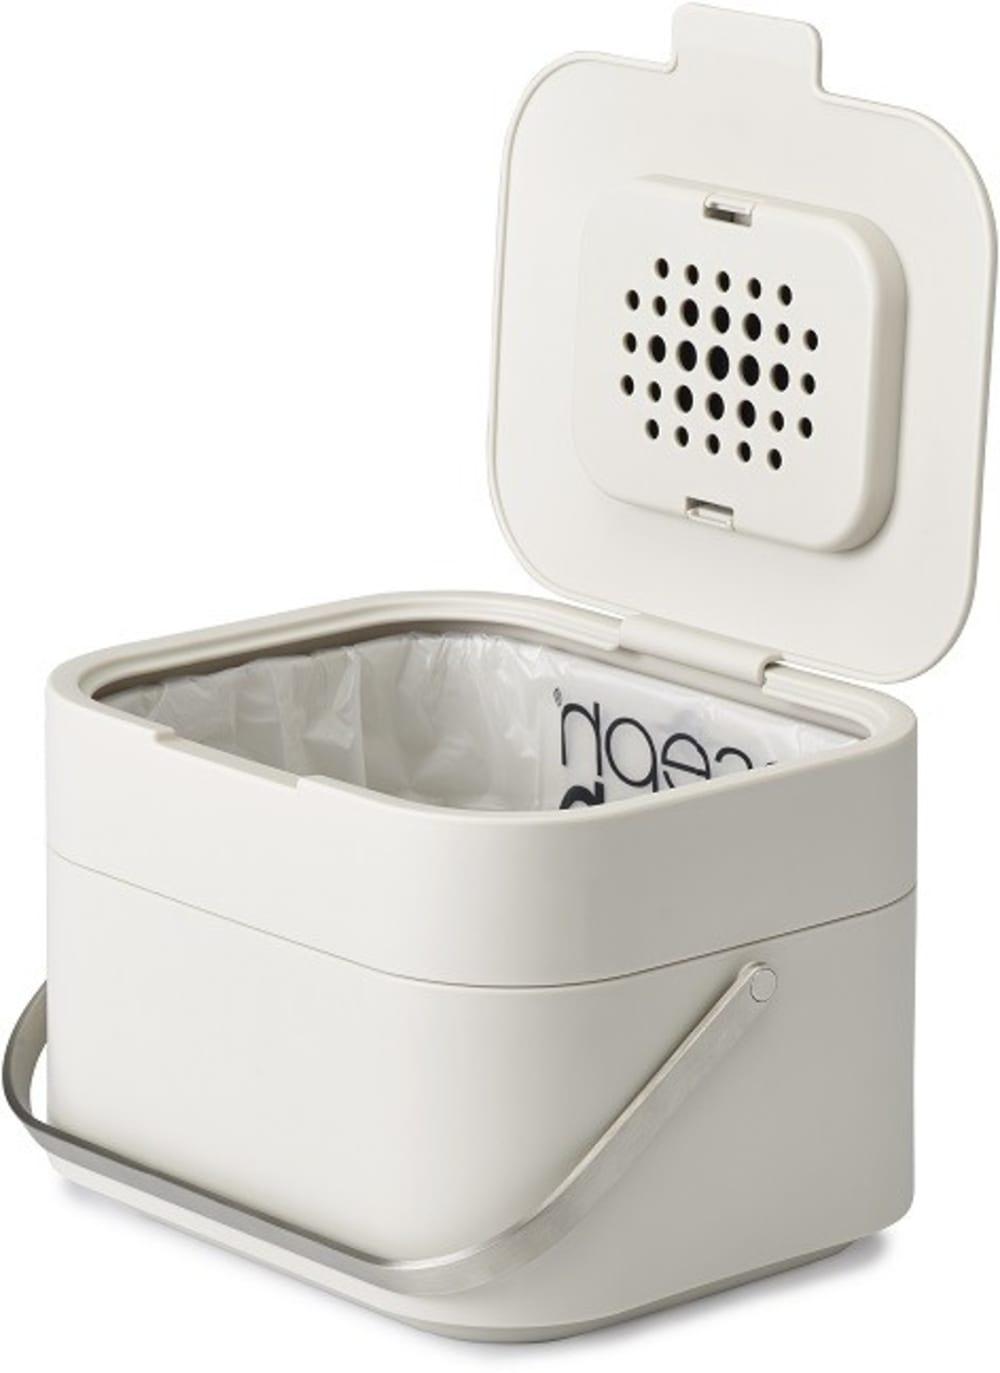 Pojemnik z filtrem STACK Intelligent Waste Joseph Joseph